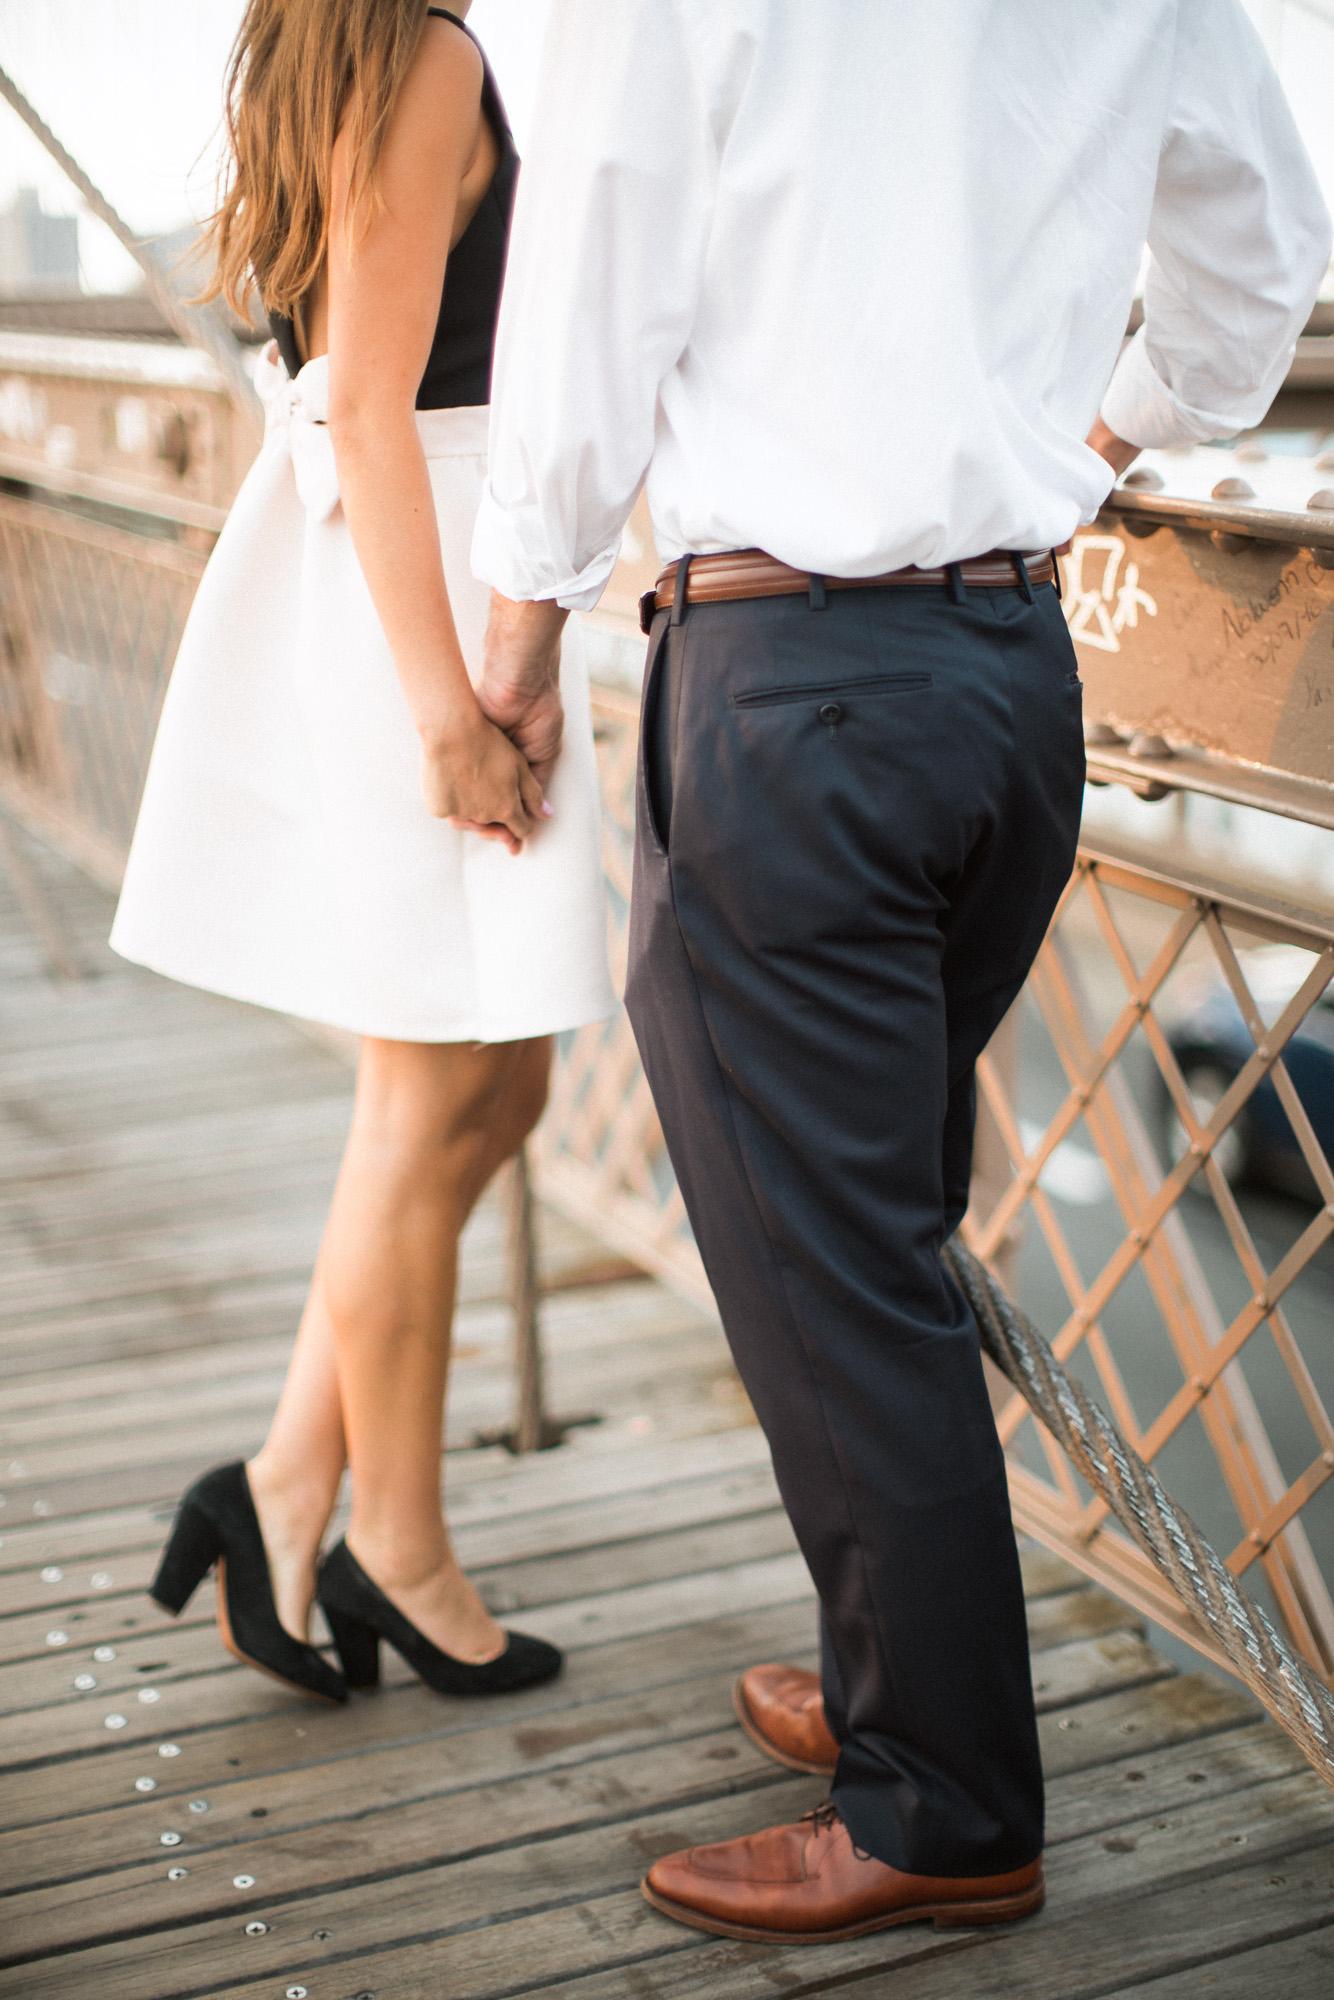 new-york-city-wedding-photography-hunter-ryan-photo-04677.jpg